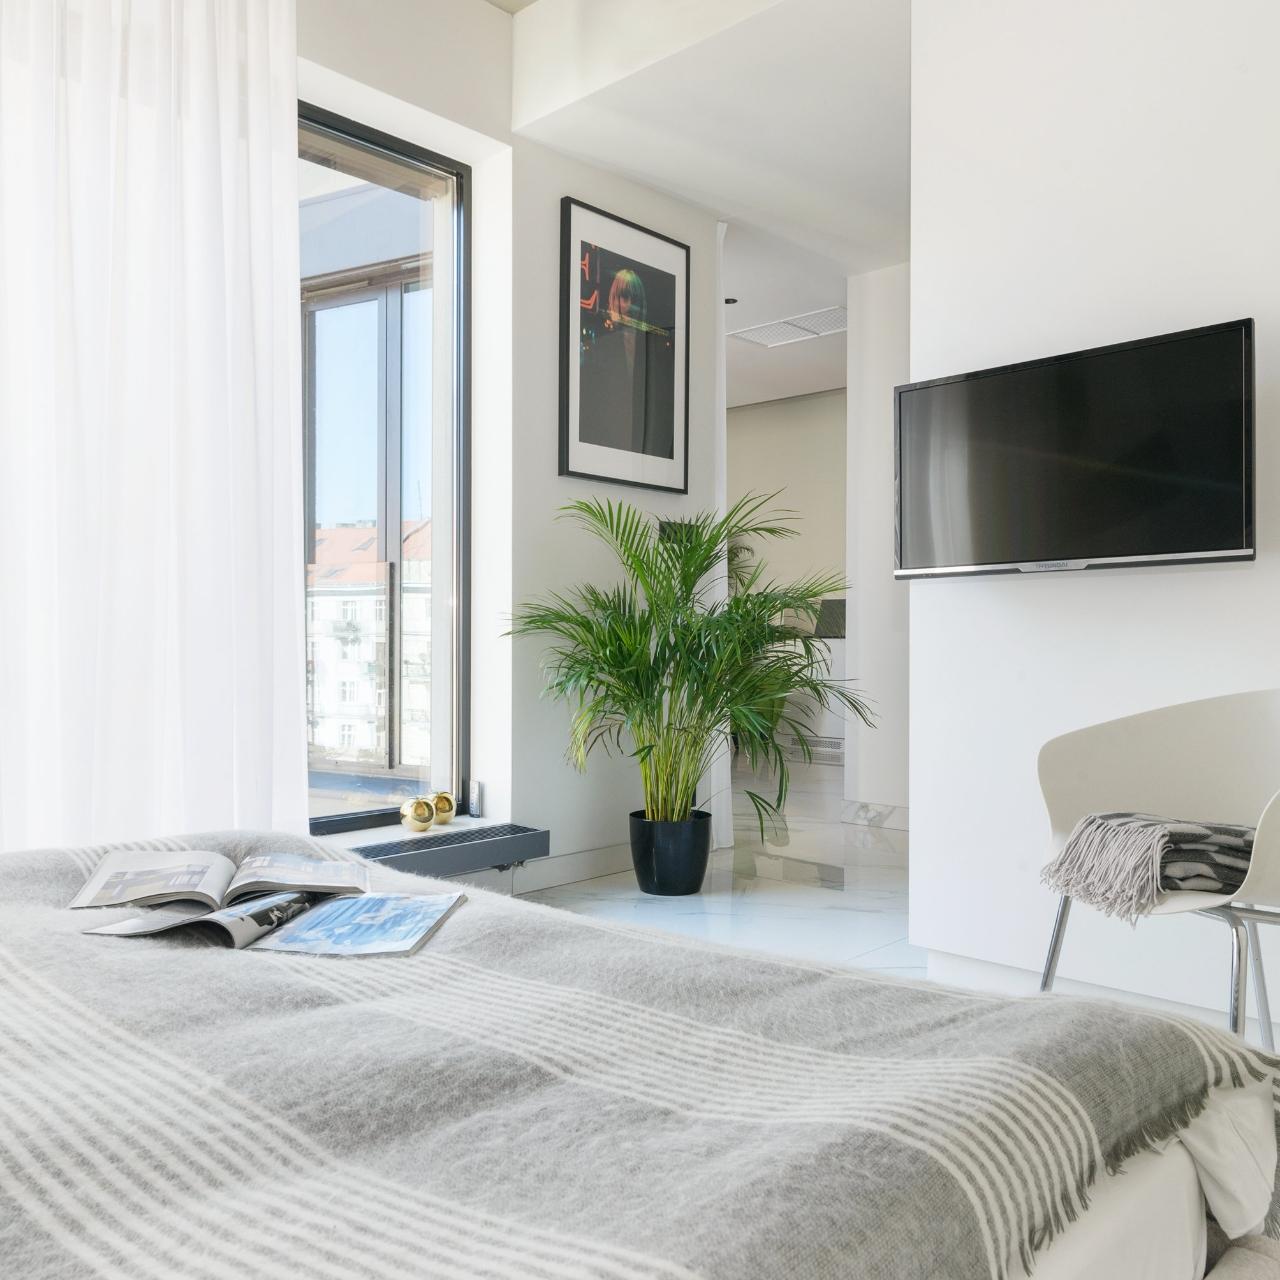 Hotel Centro Design Apartments In Poznan Greater Poland Voivodeship Hrs